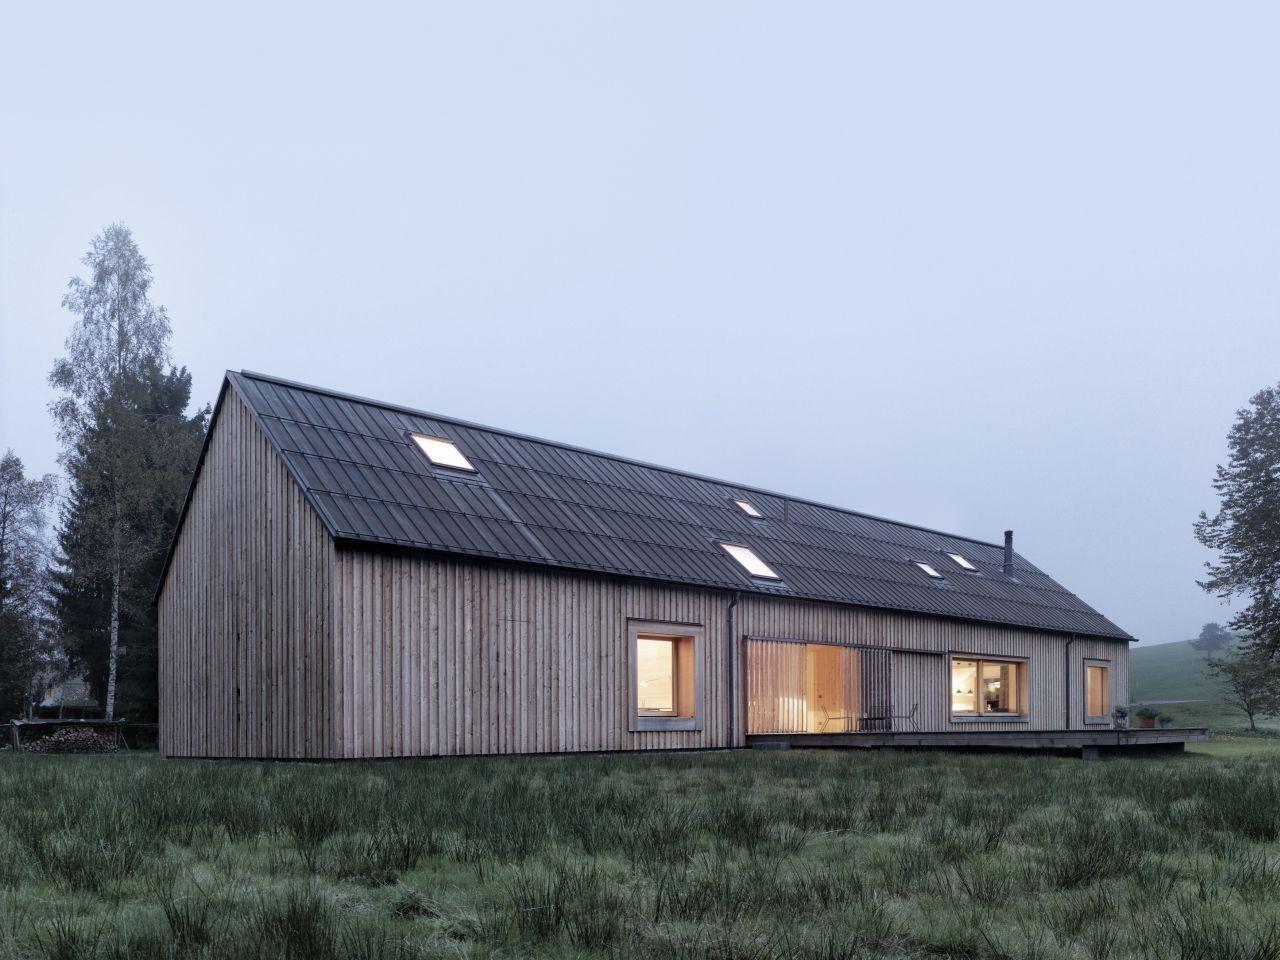 Haus Am Moor / Bernardo Bader Architects, © Adolf Bereuter